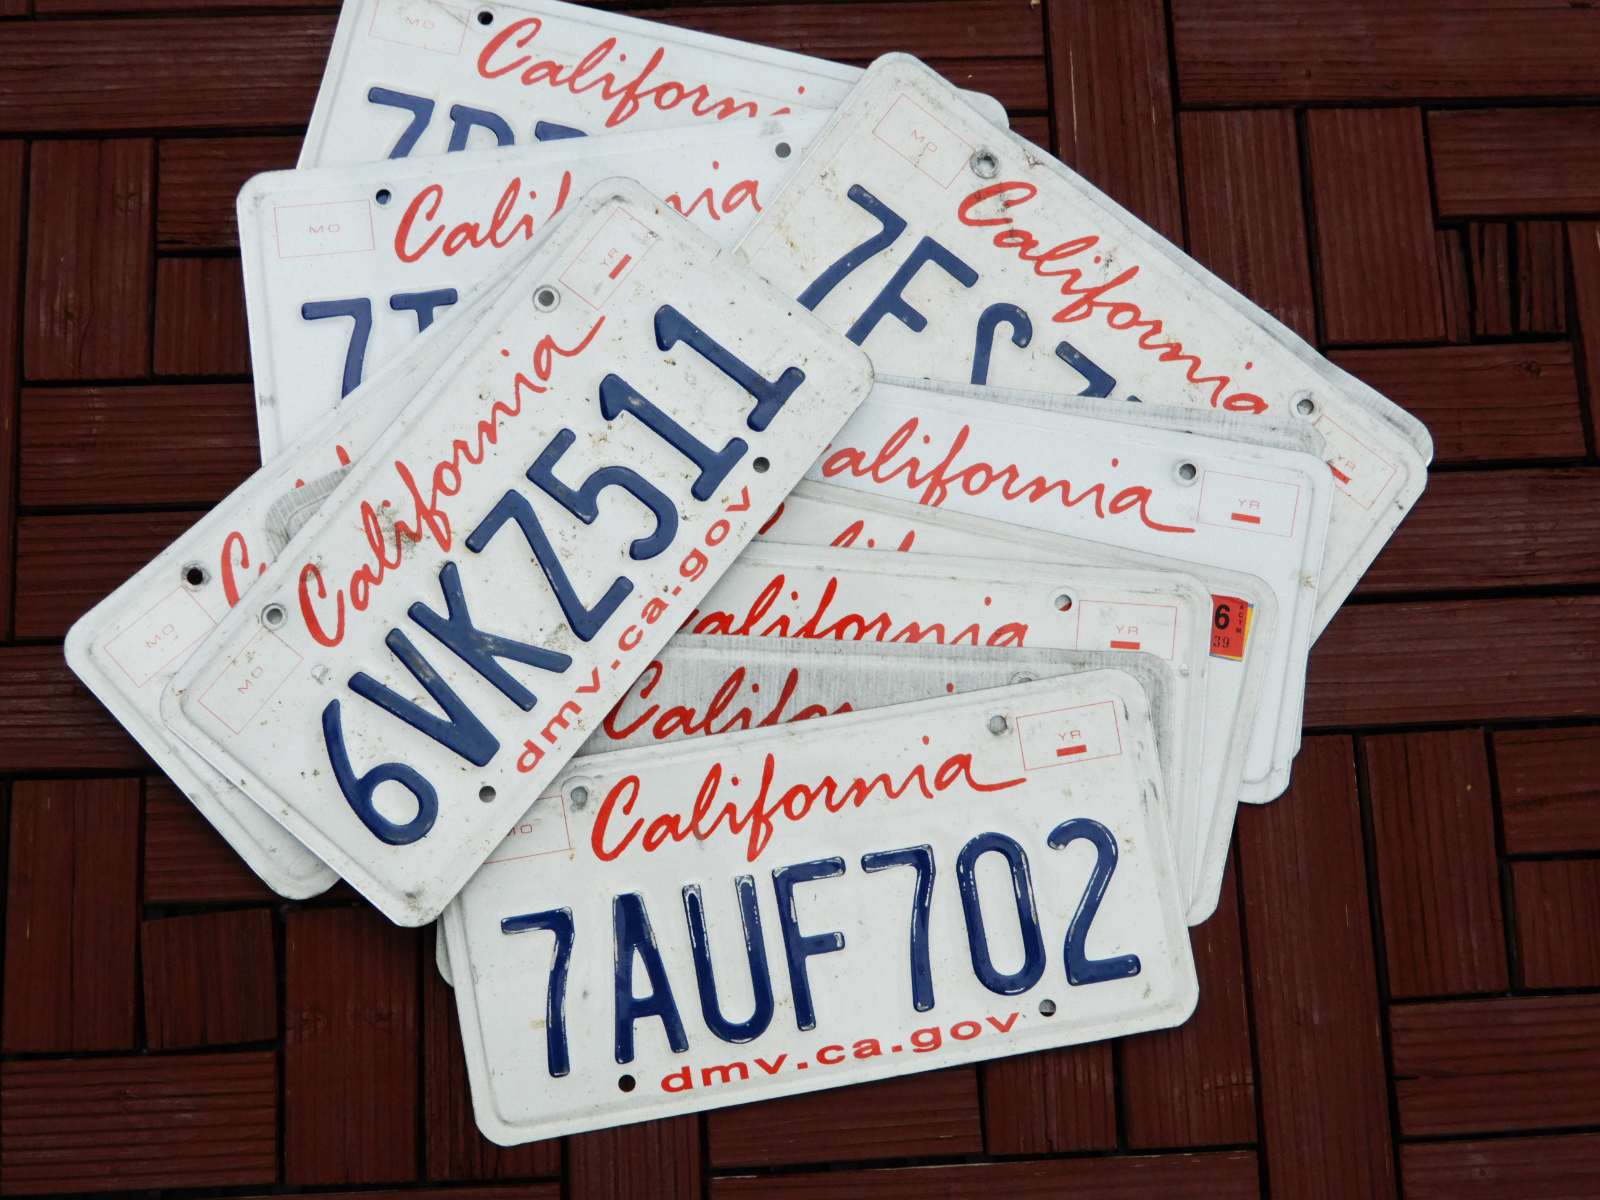 California ロゴプリントタイプのプレート届きました カリフォルニアで実際に使われていた ユーズドライセンスプレート 本物 販売実績No.1 輸入品 1枚 番号選べません PLATE LIC CALIFORNIA 新品 送料無料